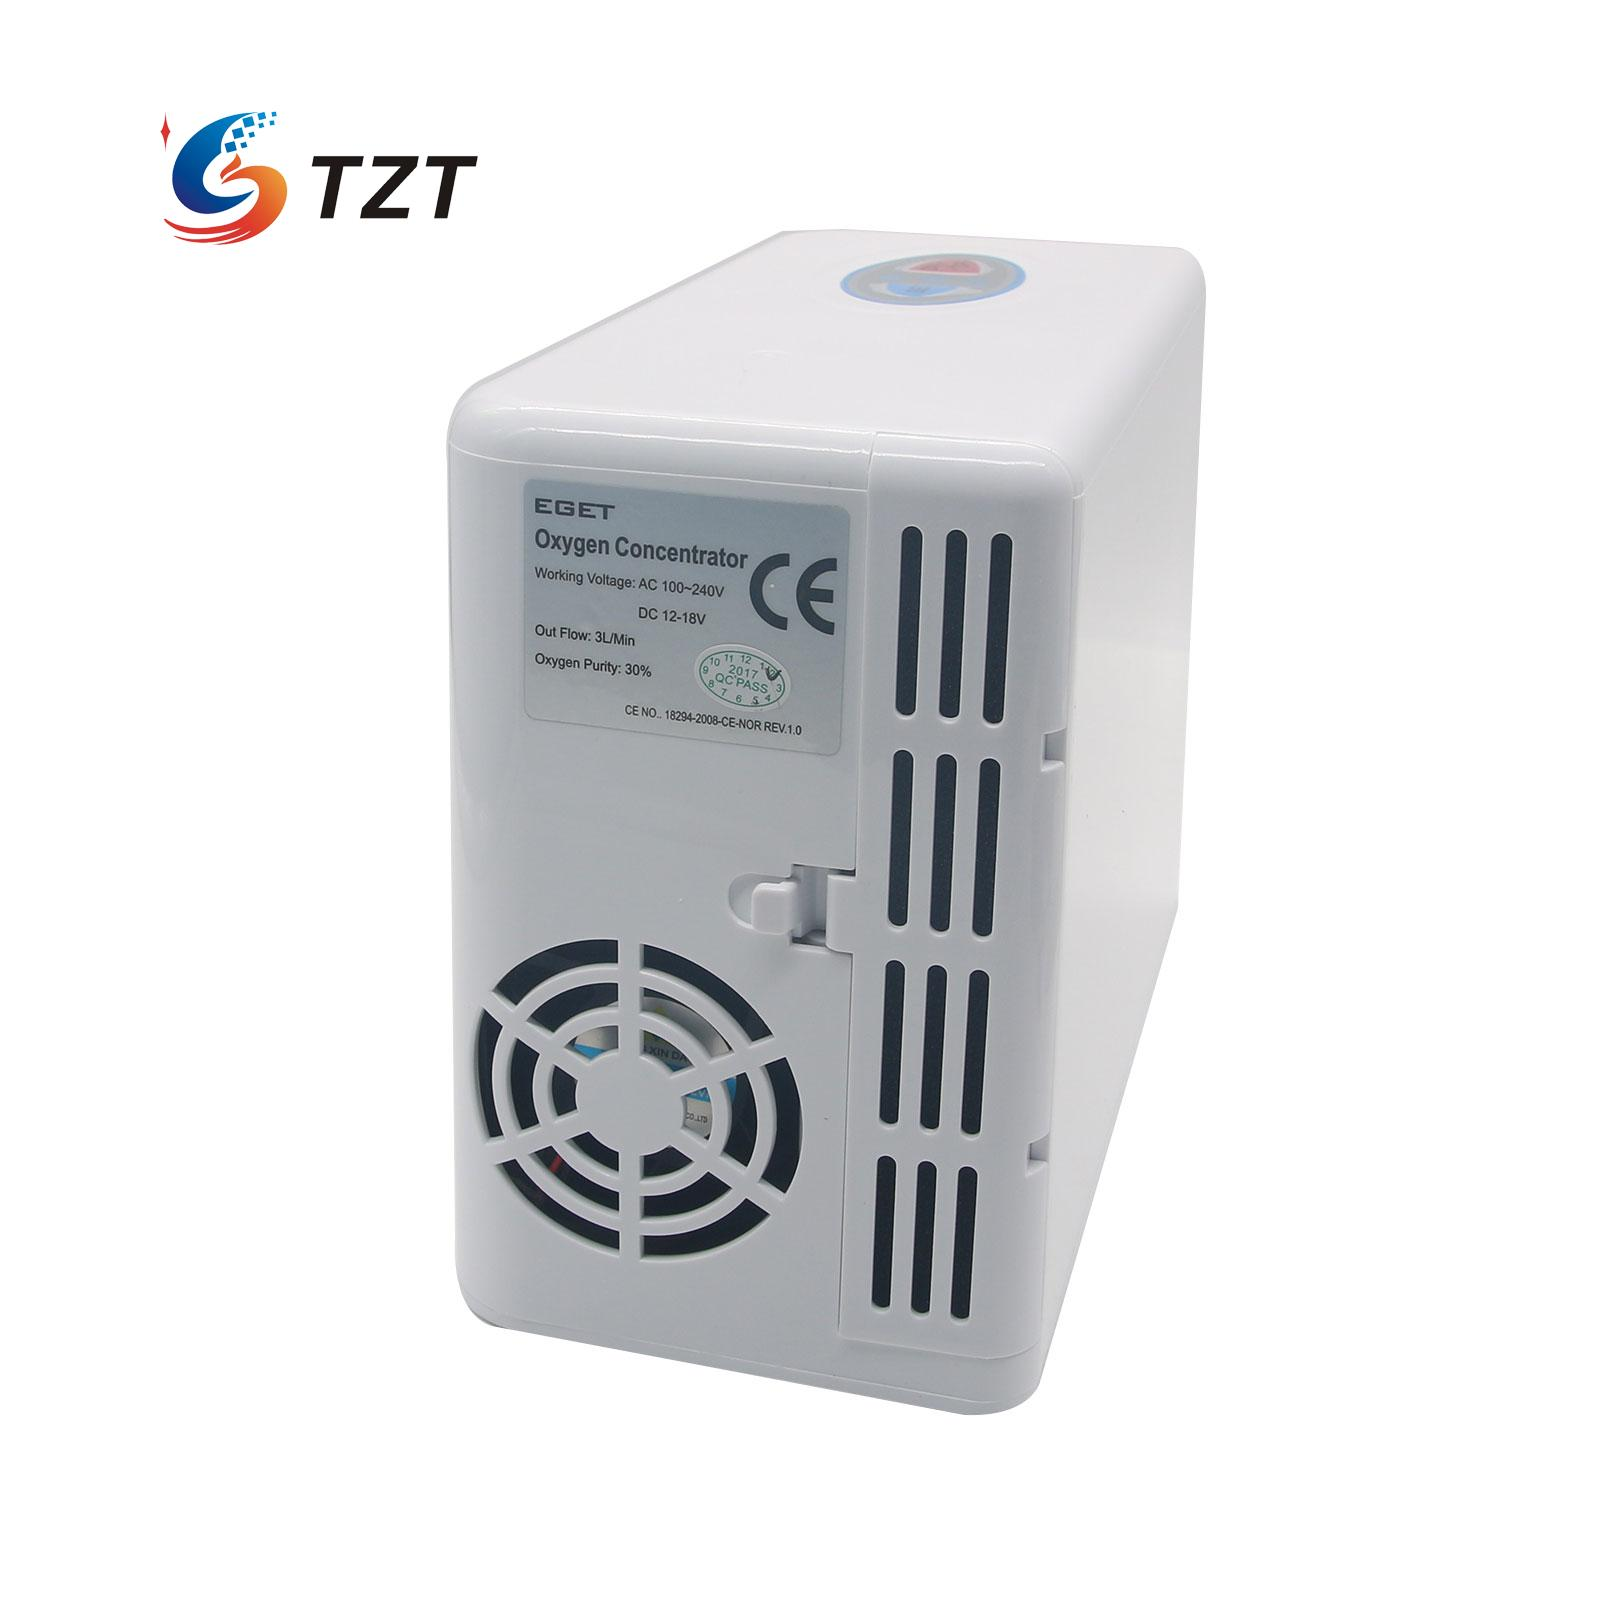 2017 MO H04CD Portable Oxygen Concentrator Generator e Battery